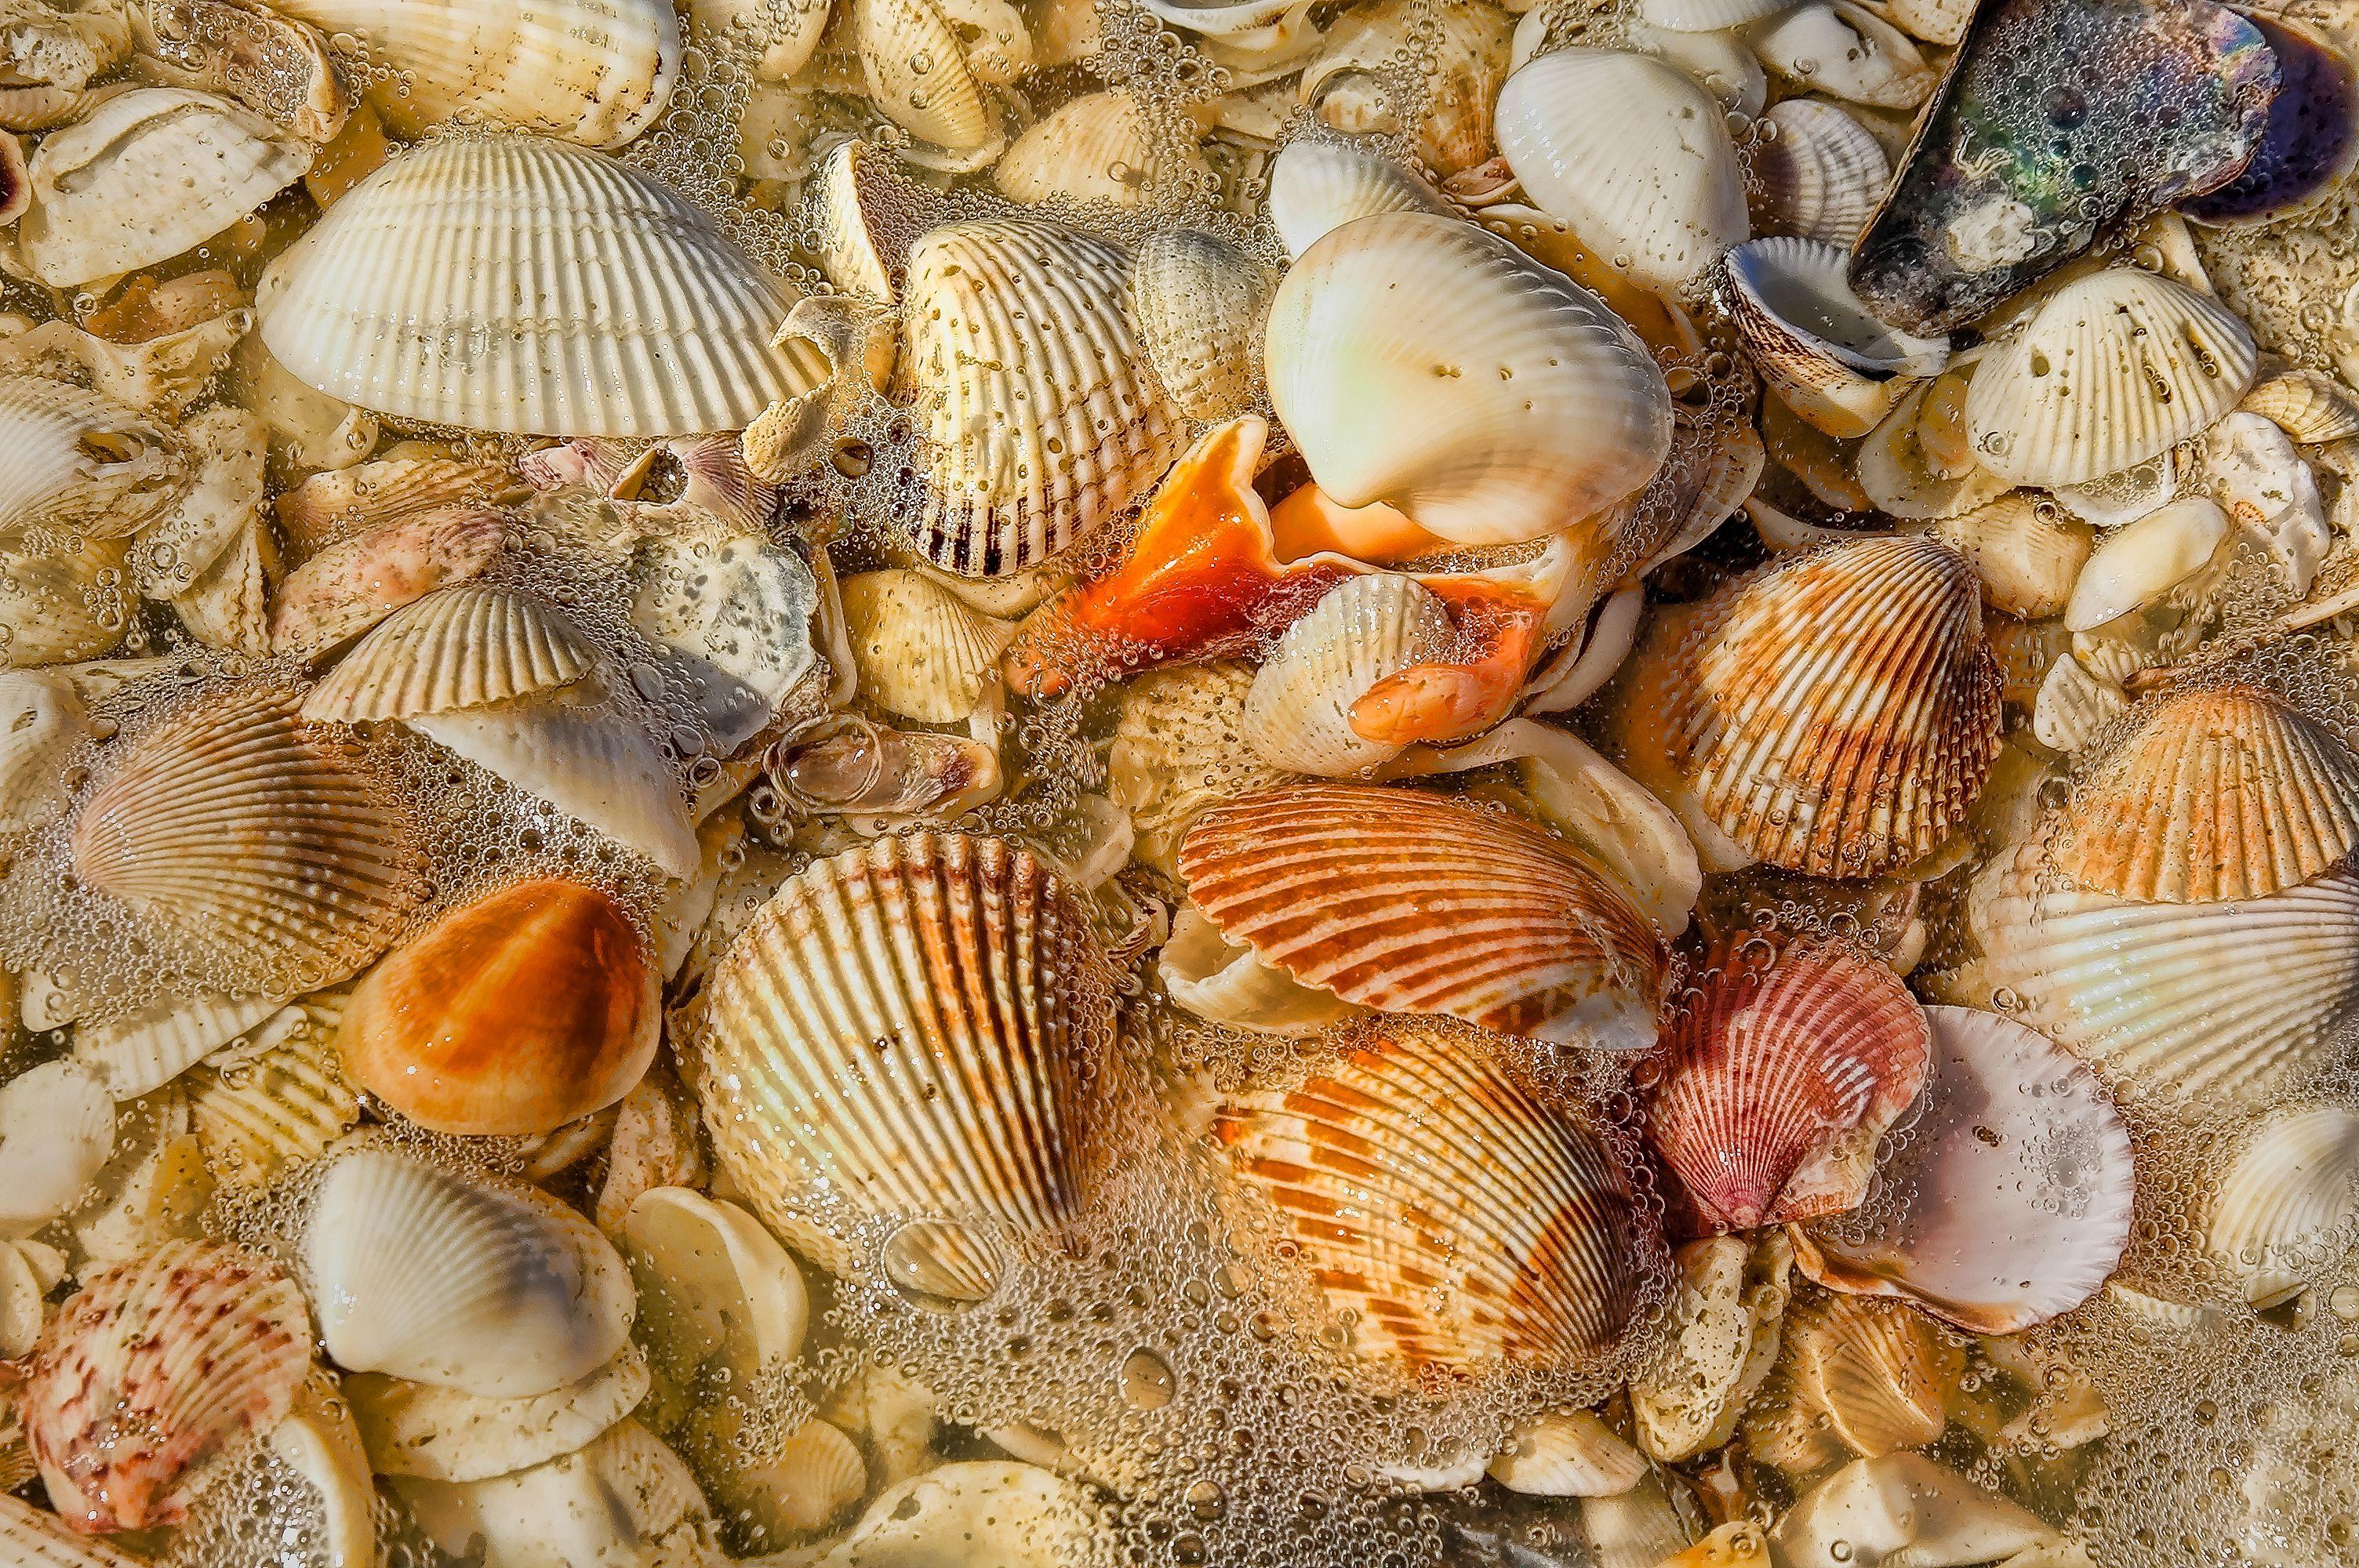 Sea shells after the wave, Sanibel Island, Florida